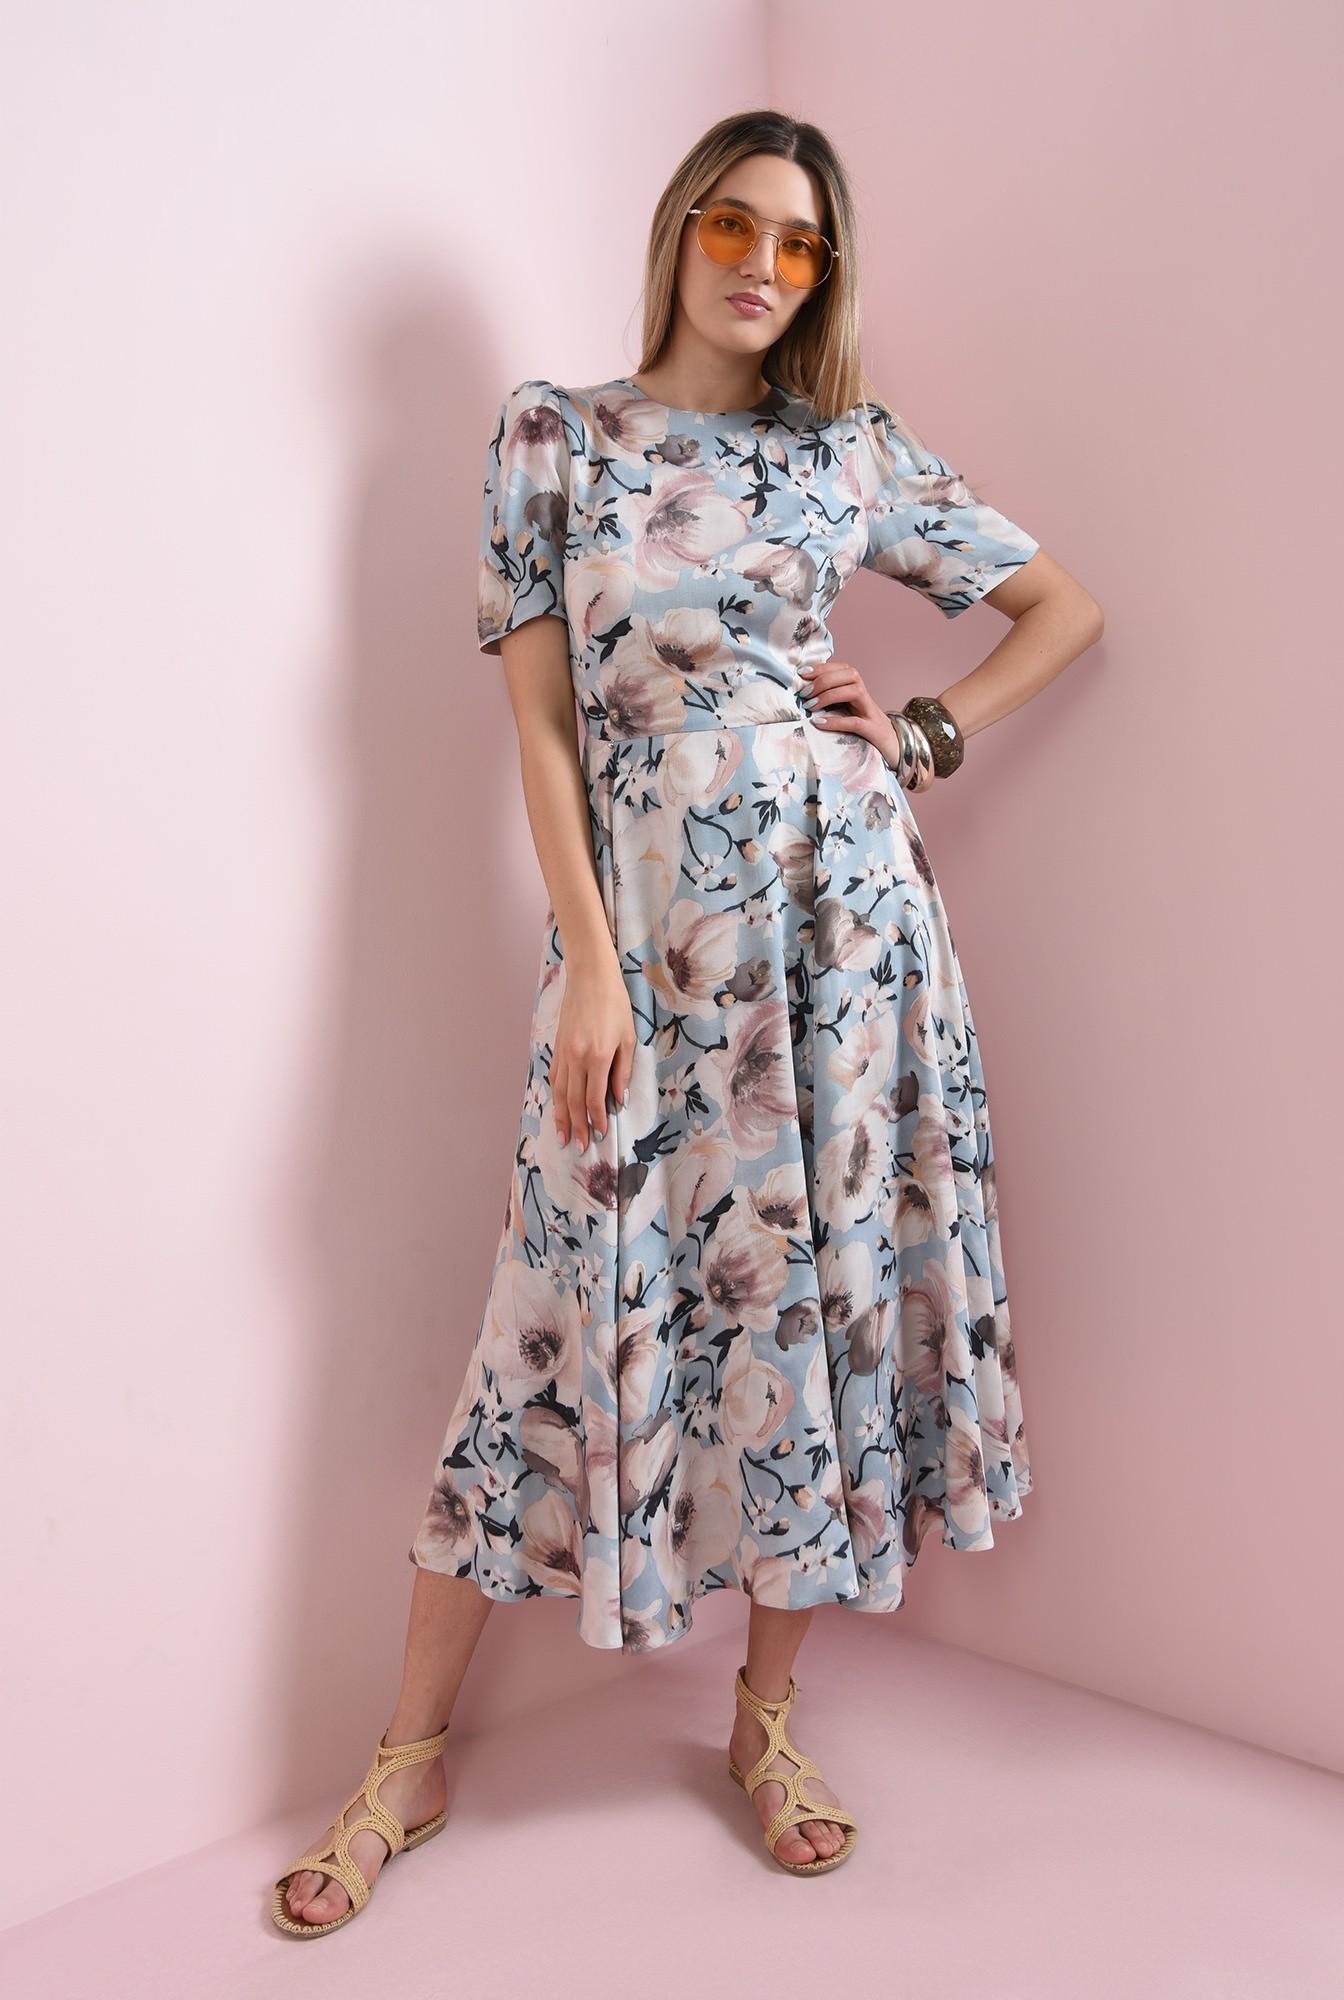 0 - rochie evazata, bleu, cu print, Poema